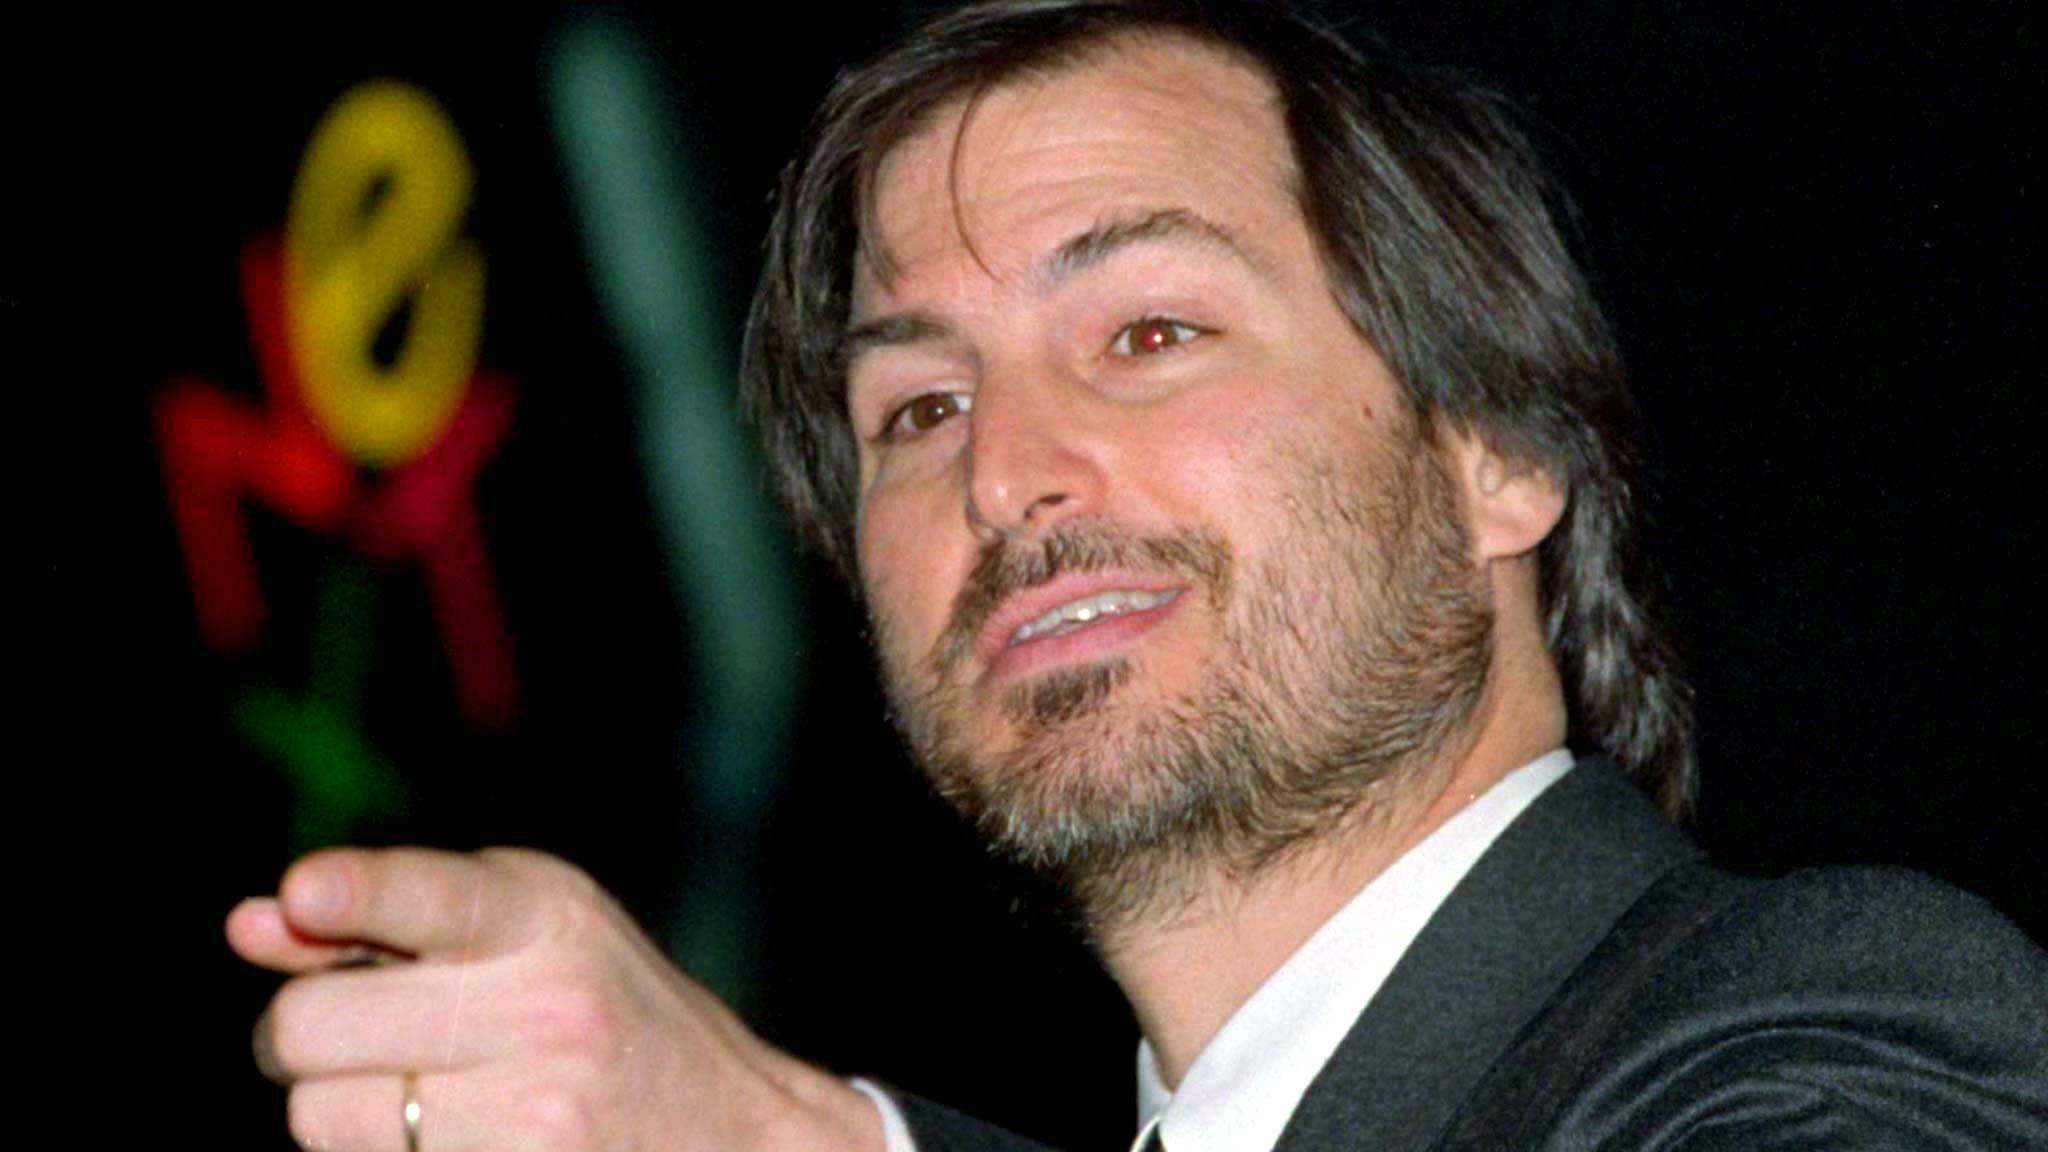 Steve Jobs young apple photo